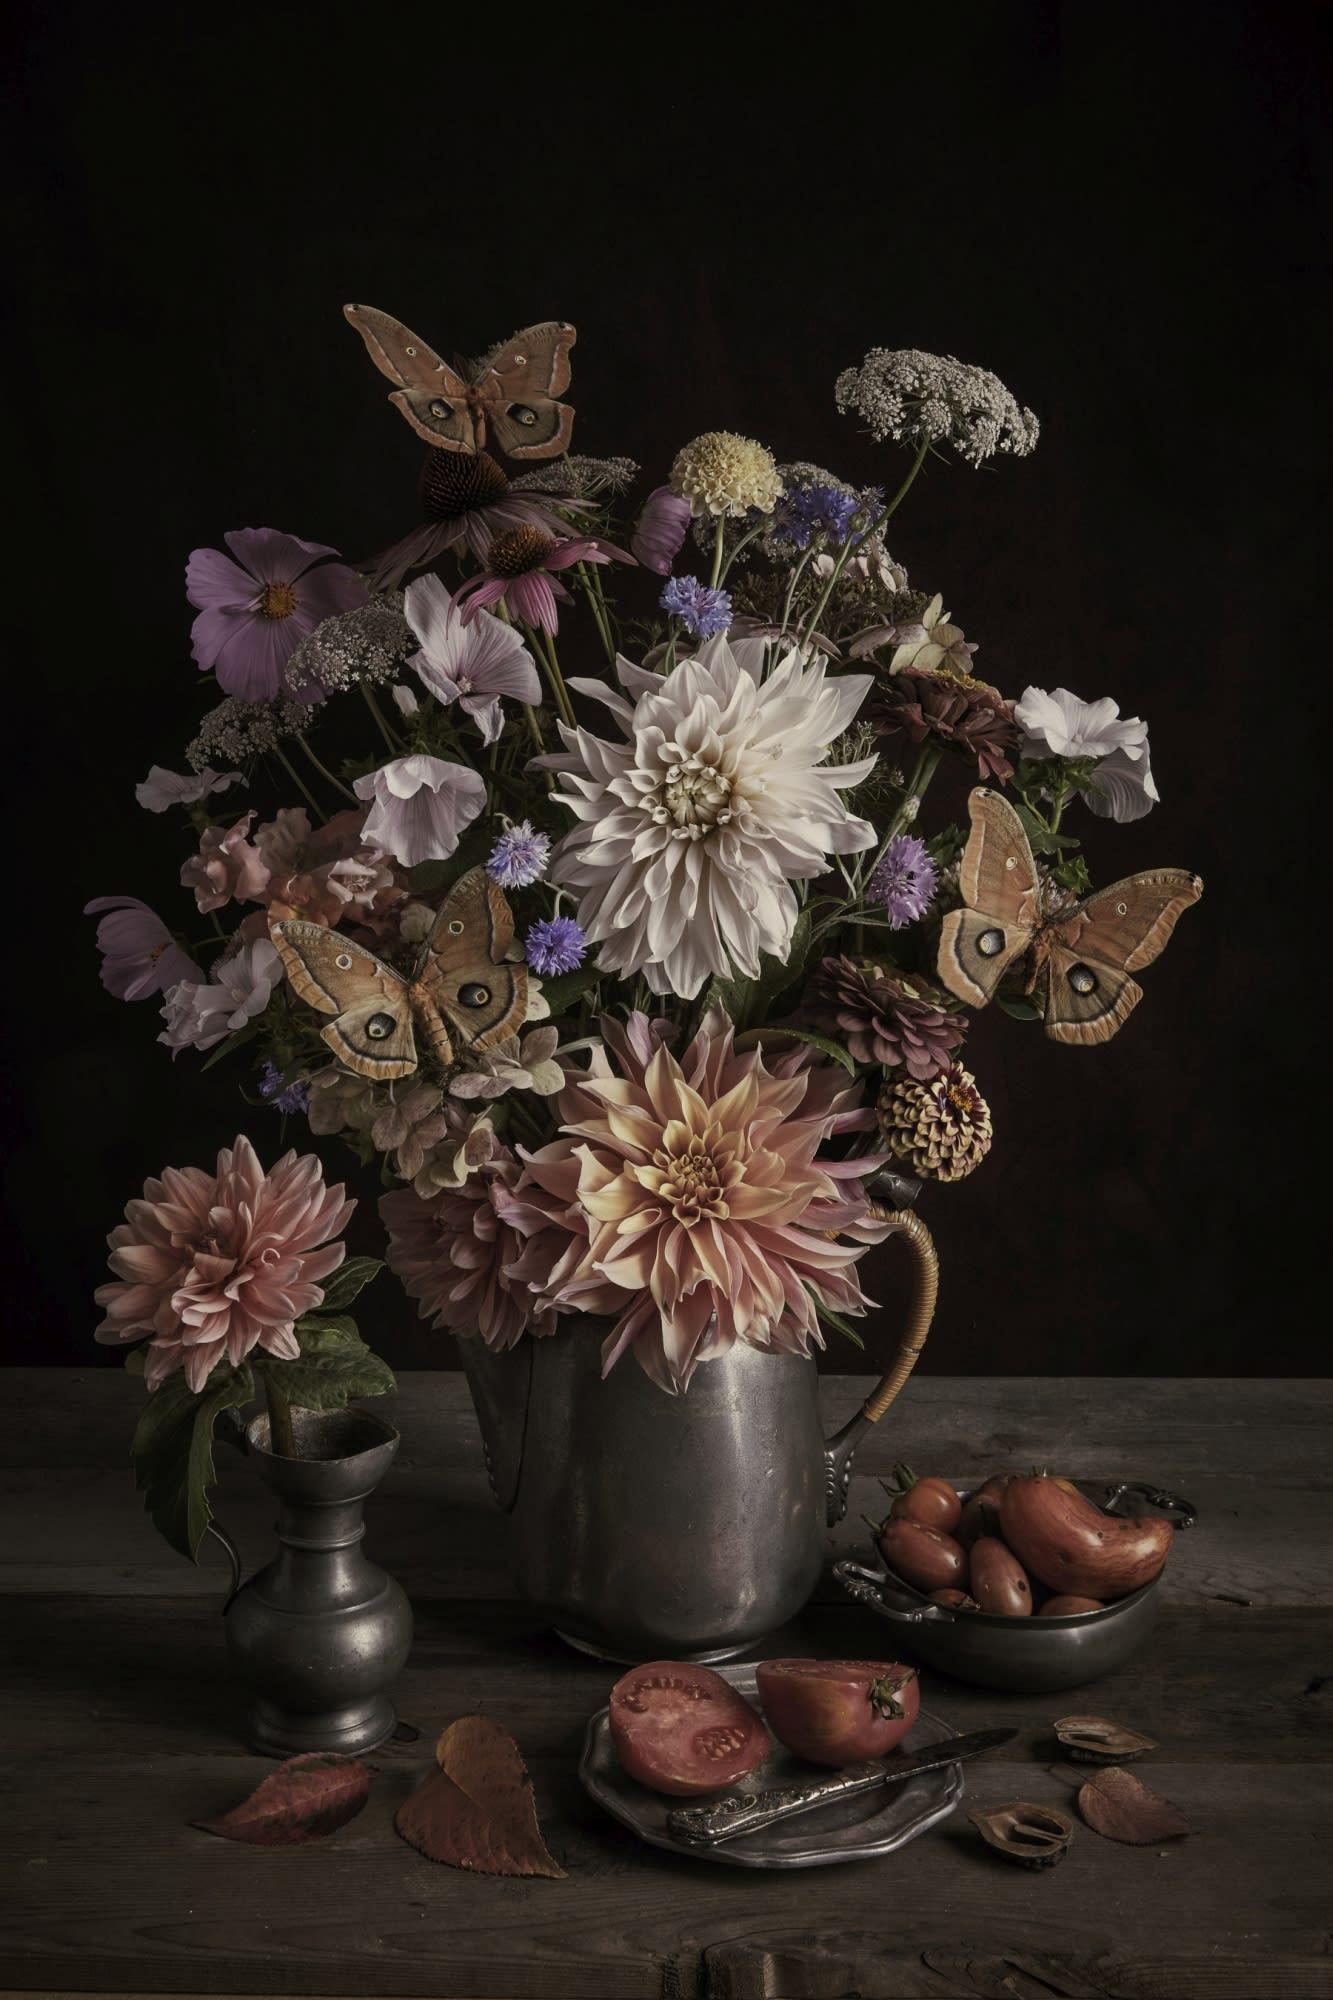 'Dahlia & Moths' by Kristin Sjarrda at Gallery 133